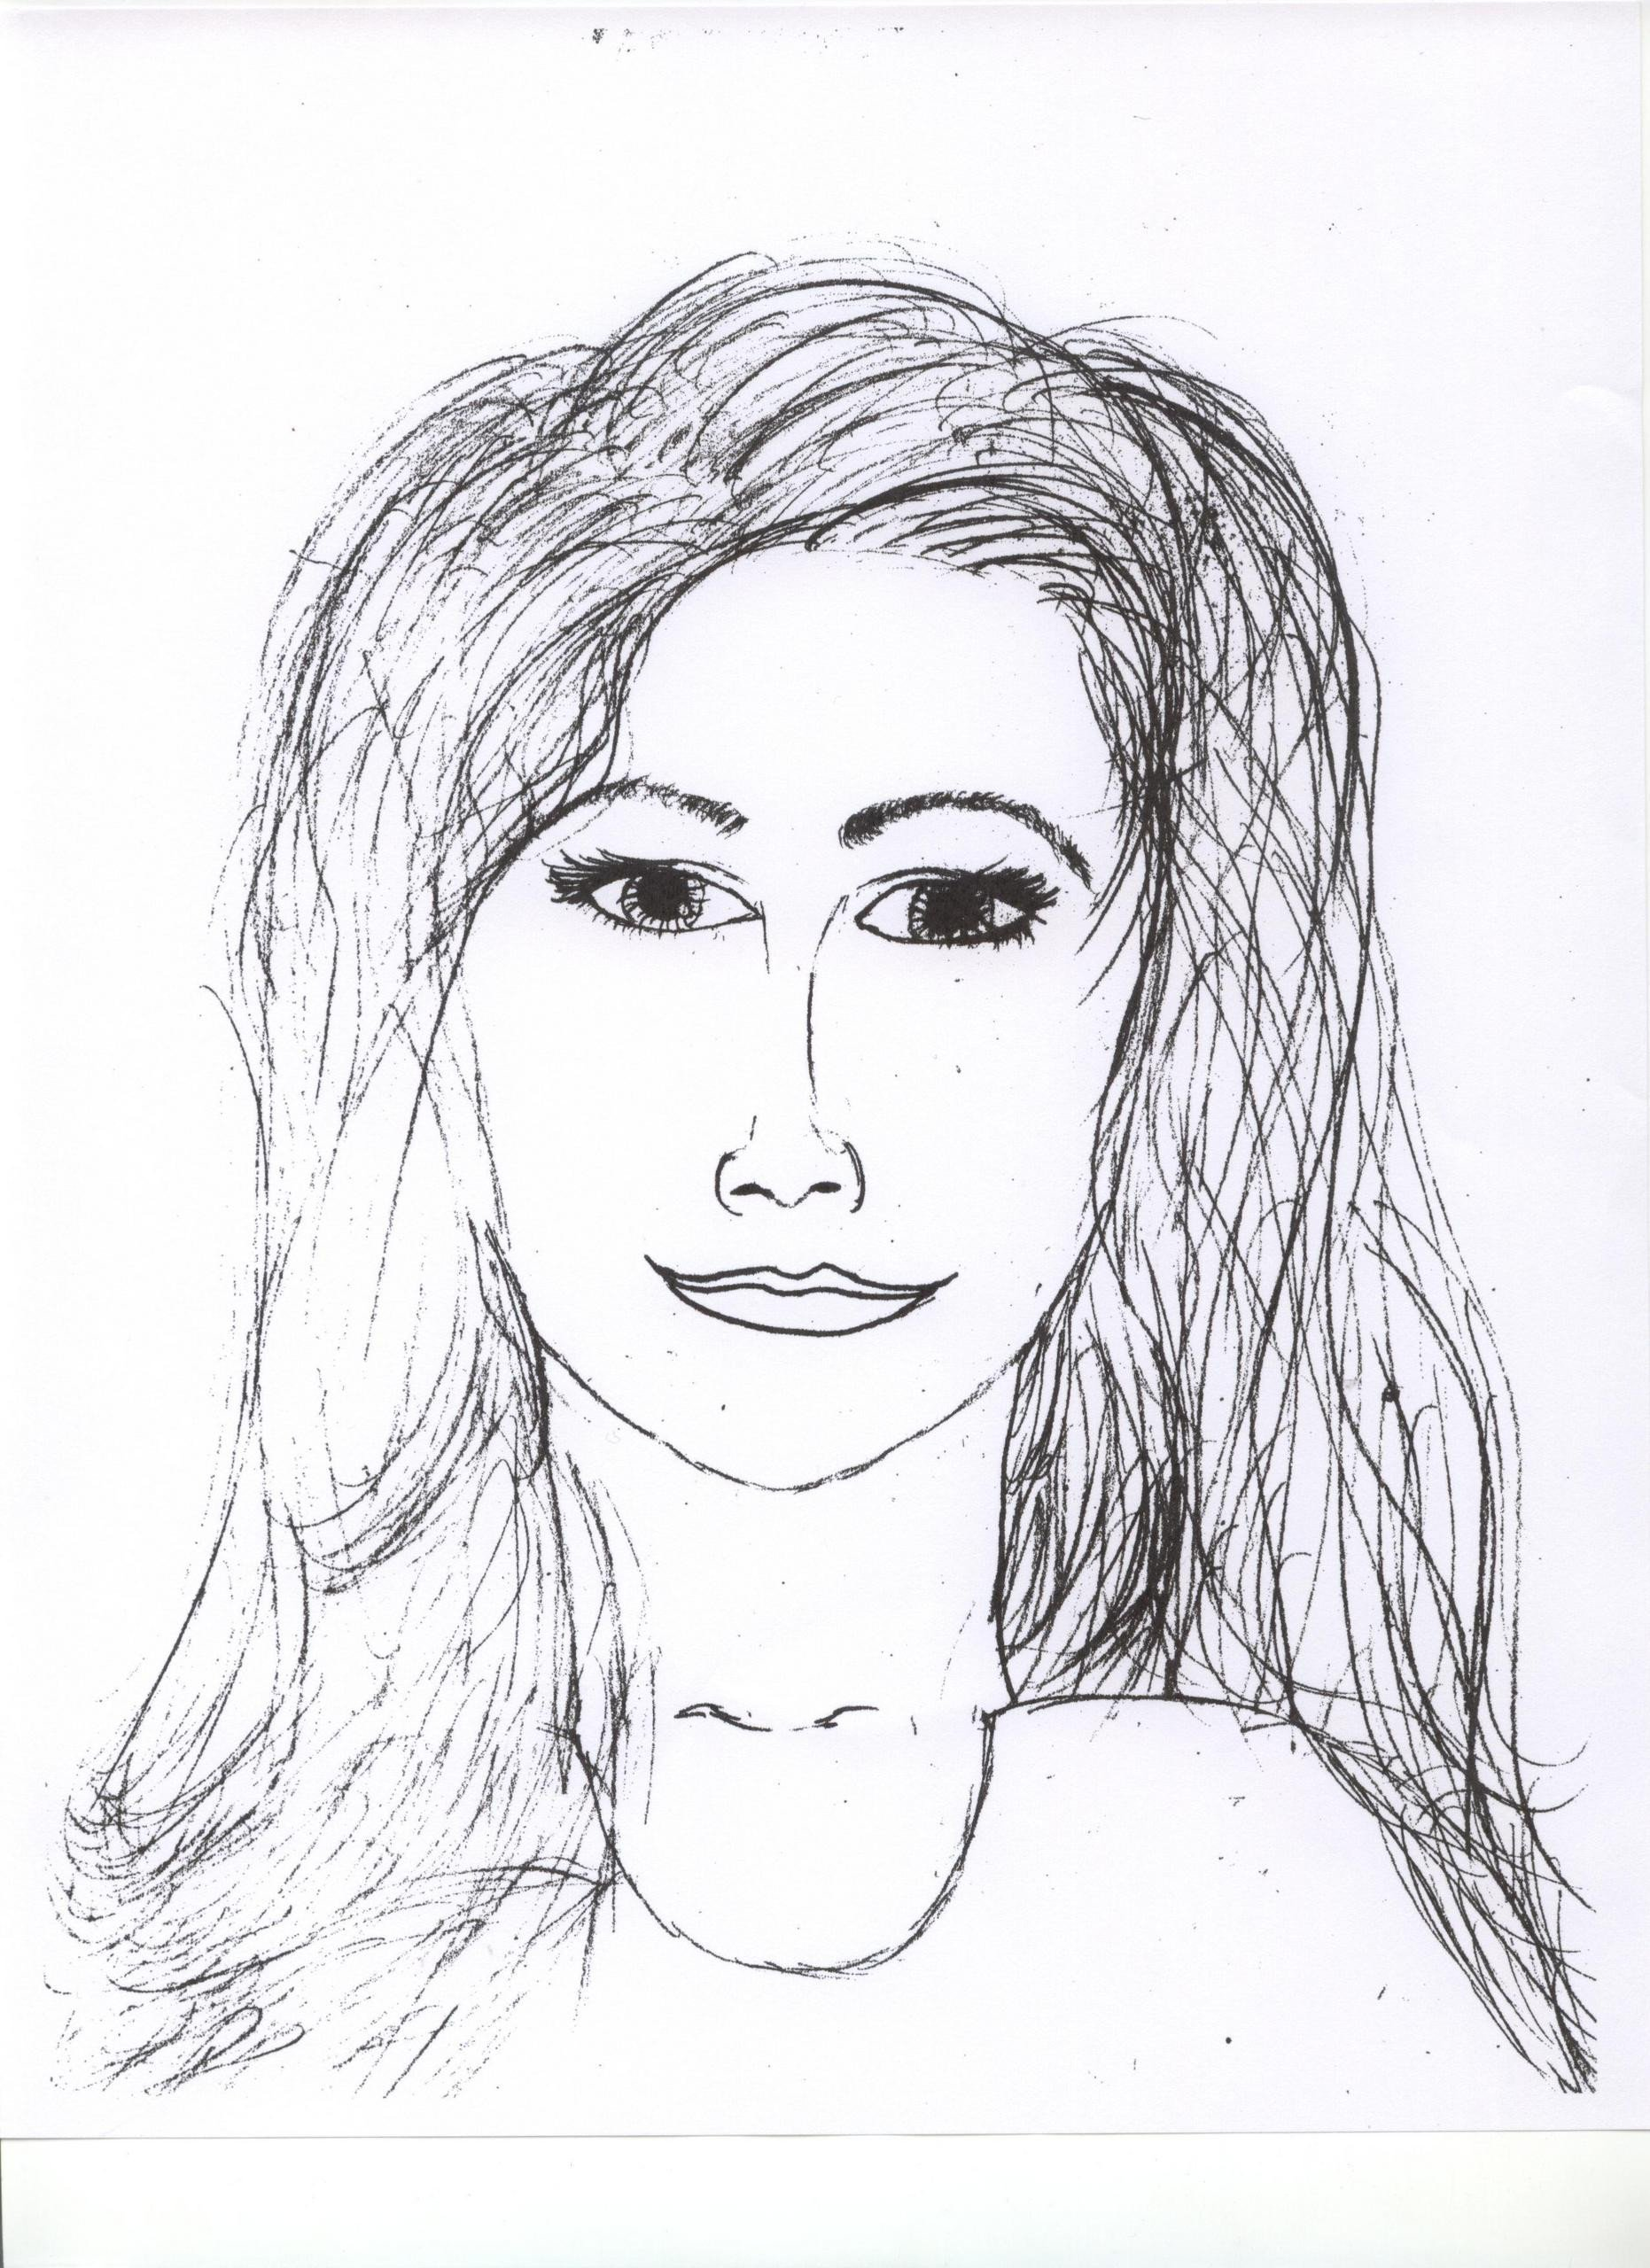 Sketch Of A Girl My Drawing Of A Woman Vanillamoon08 Fanpop